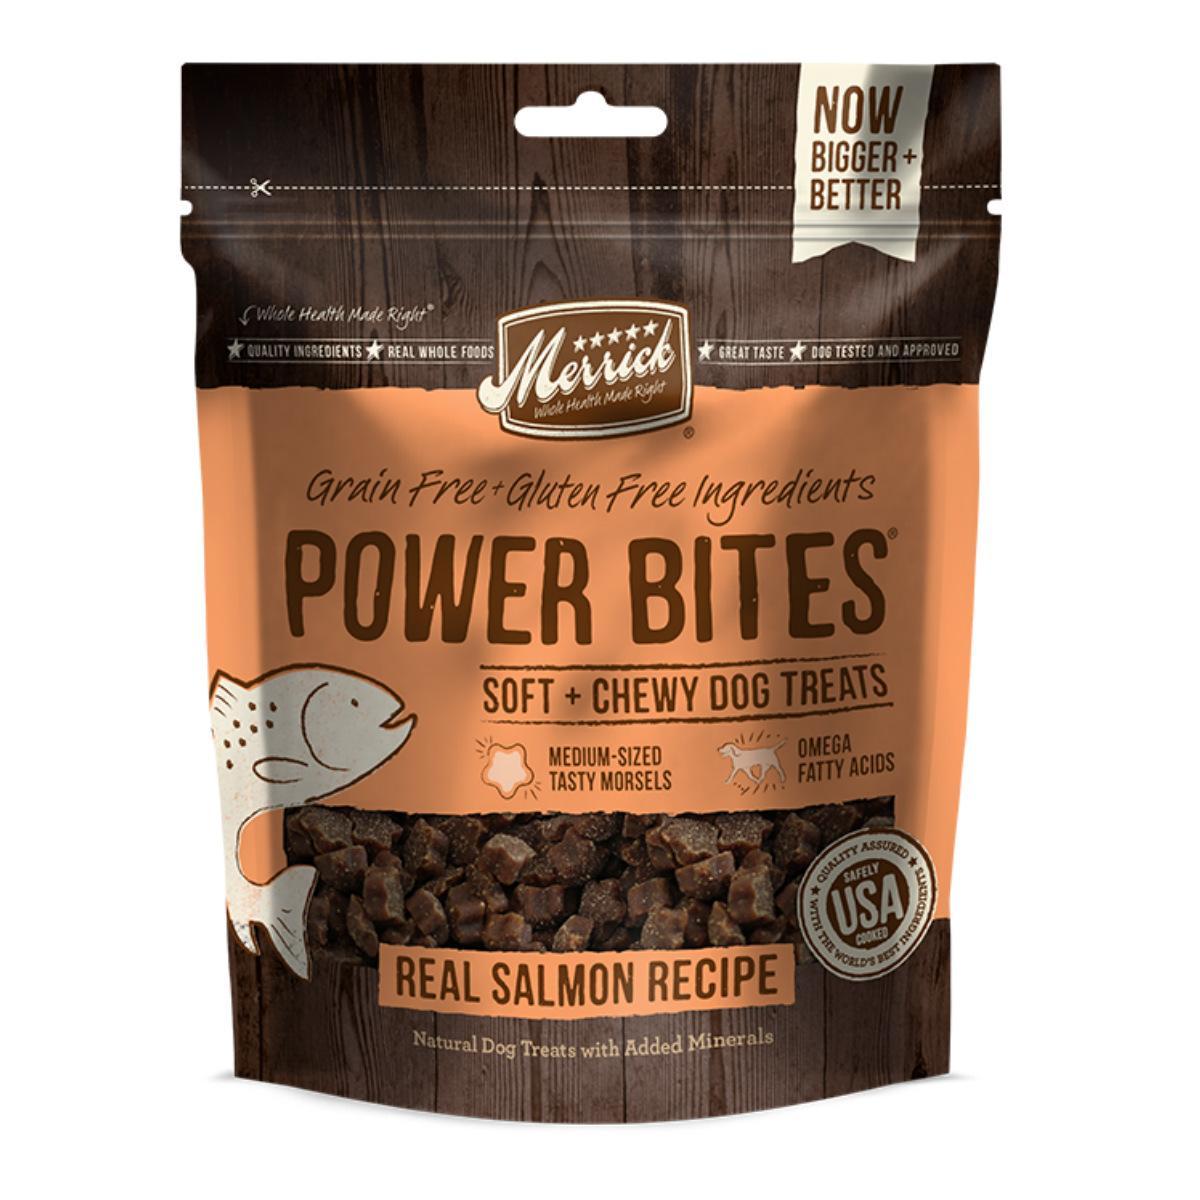 Merrick Power Bites Dog Treats - Real Salmon